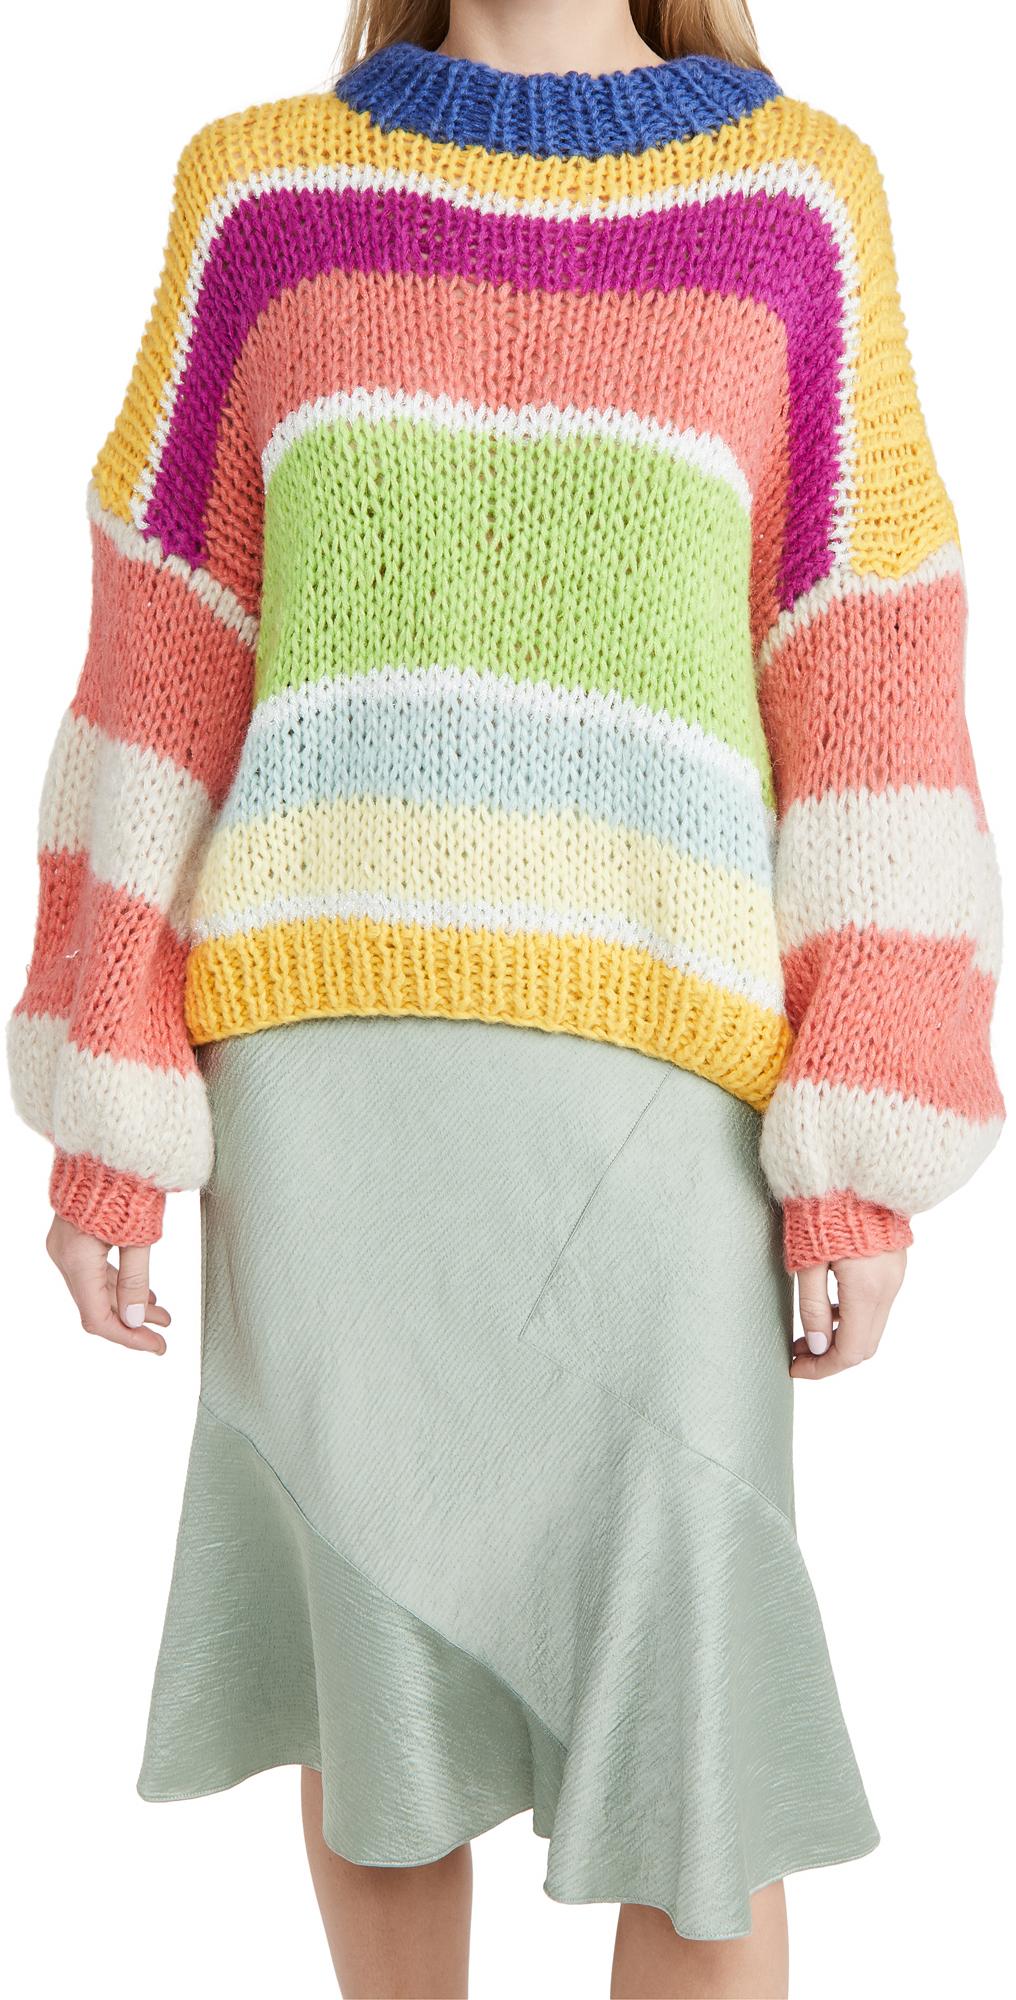 CeliaB Maya Mohair Sweater